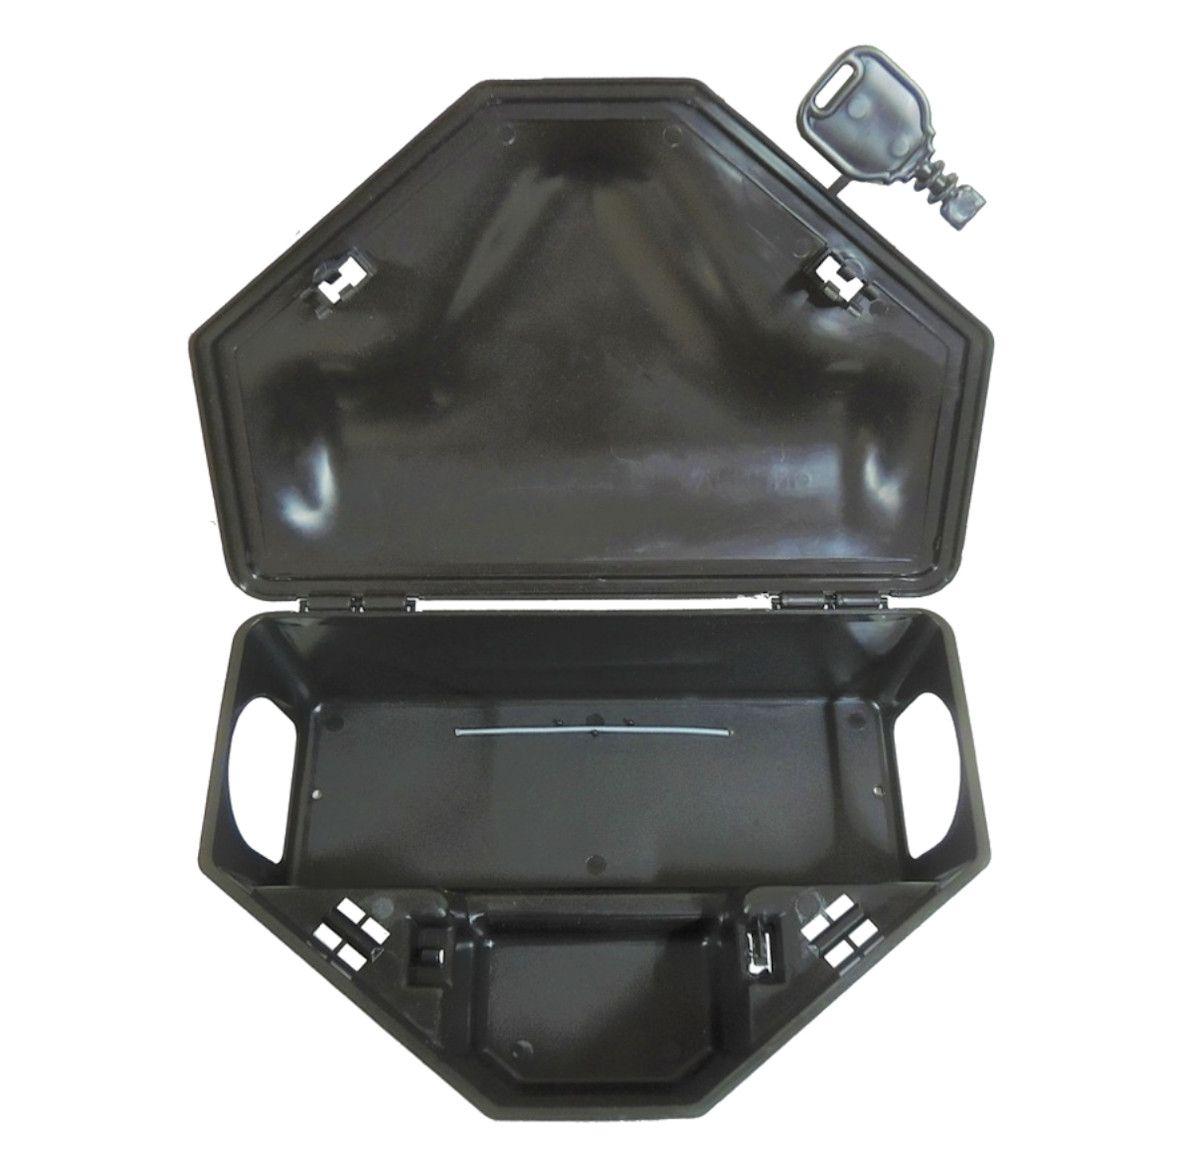 Kit 68 Porta Isca Com 2 Chaves - Duplo Travamento